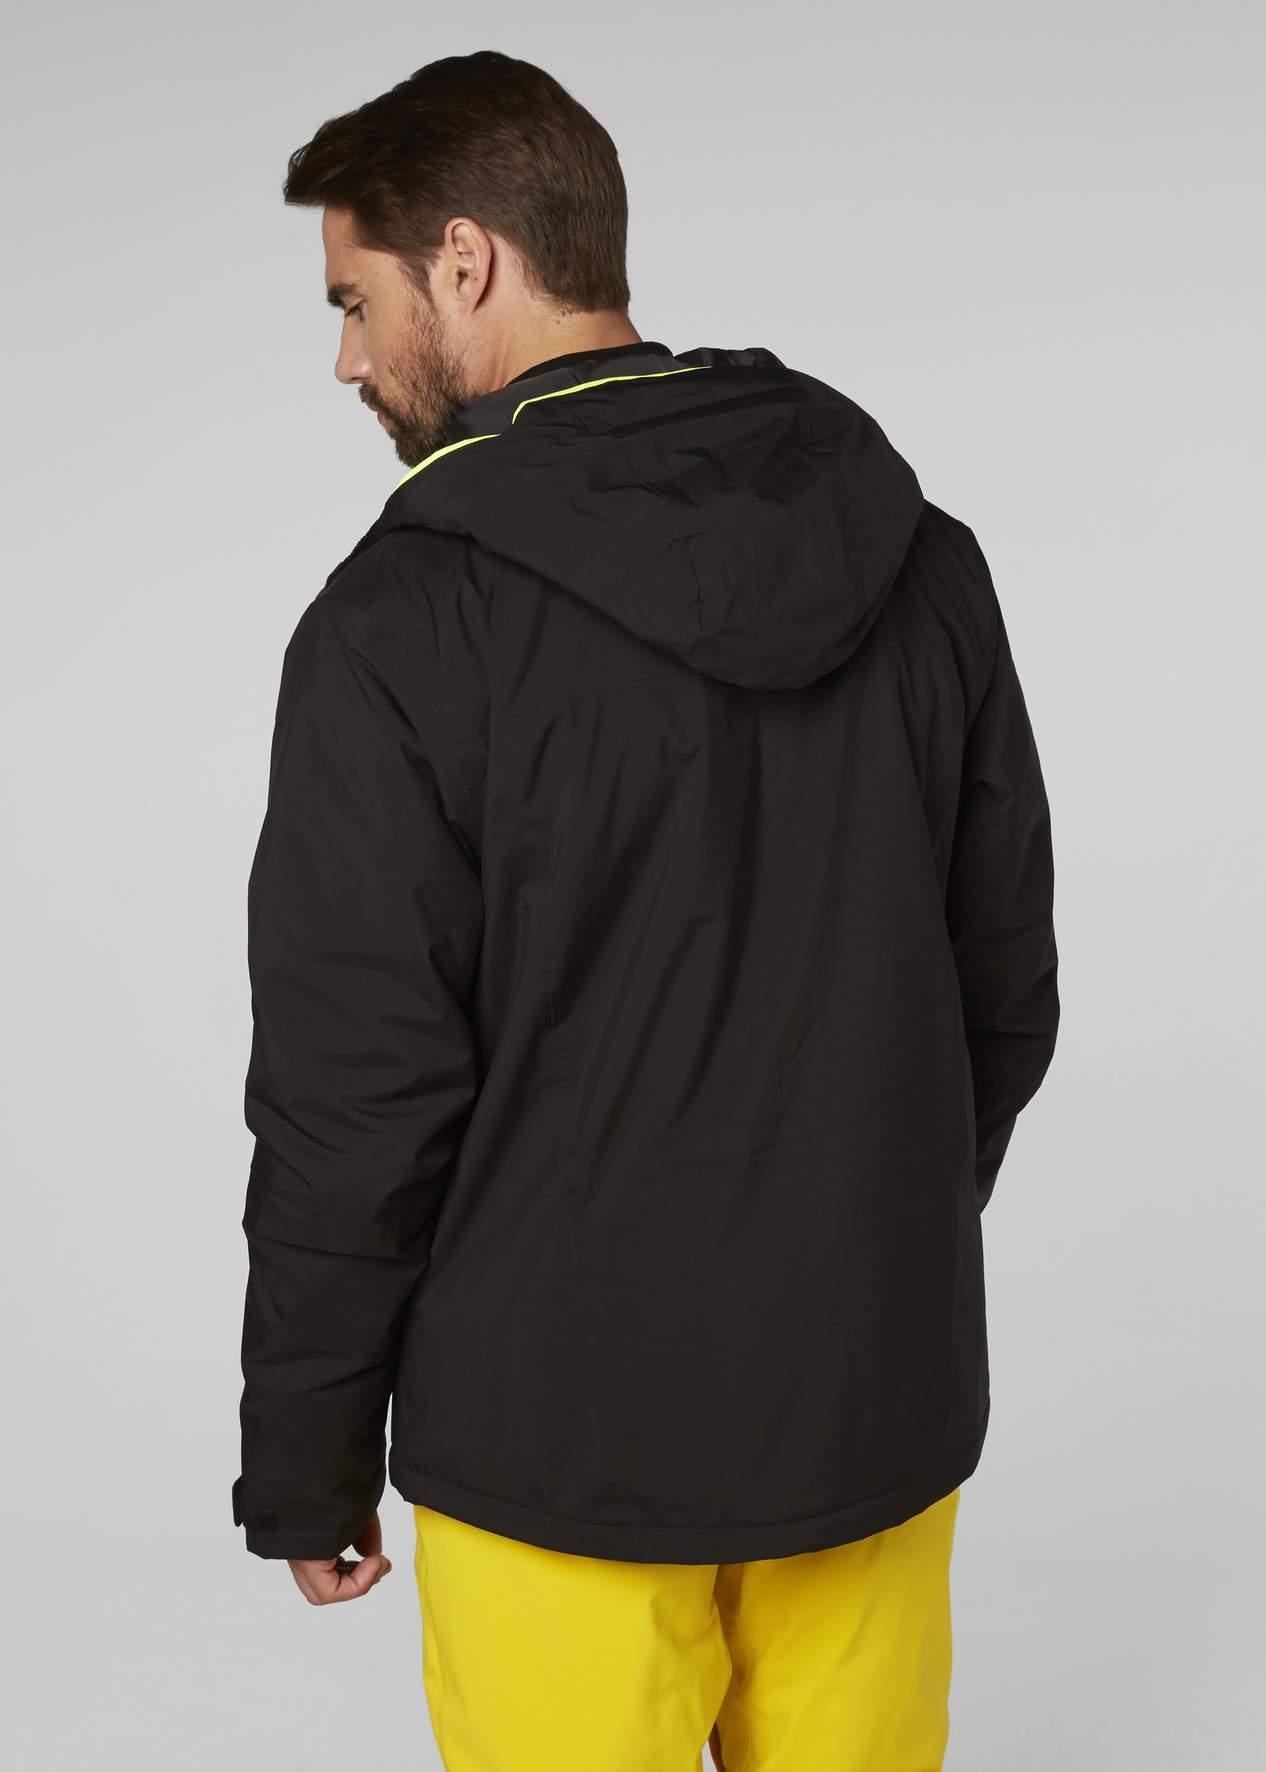 kurtka narciarska męska helly hansen charger jacket